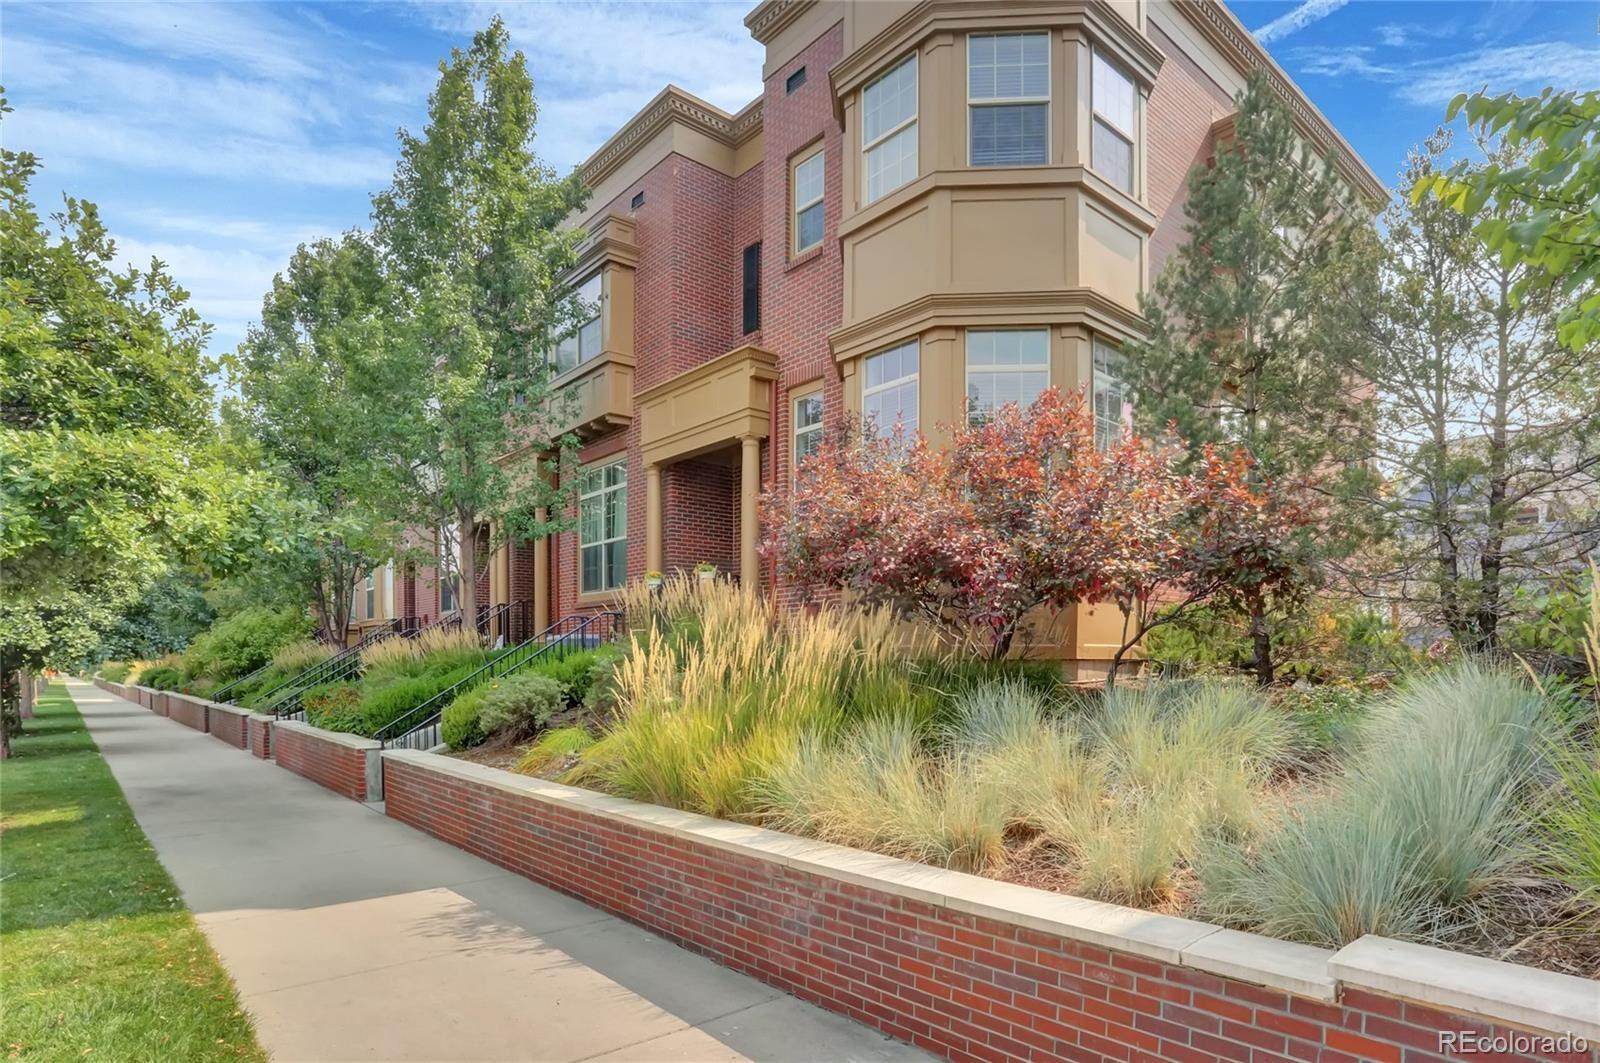 7902 E 29th Avenue, Denver, CO 80238 - #: 6687724